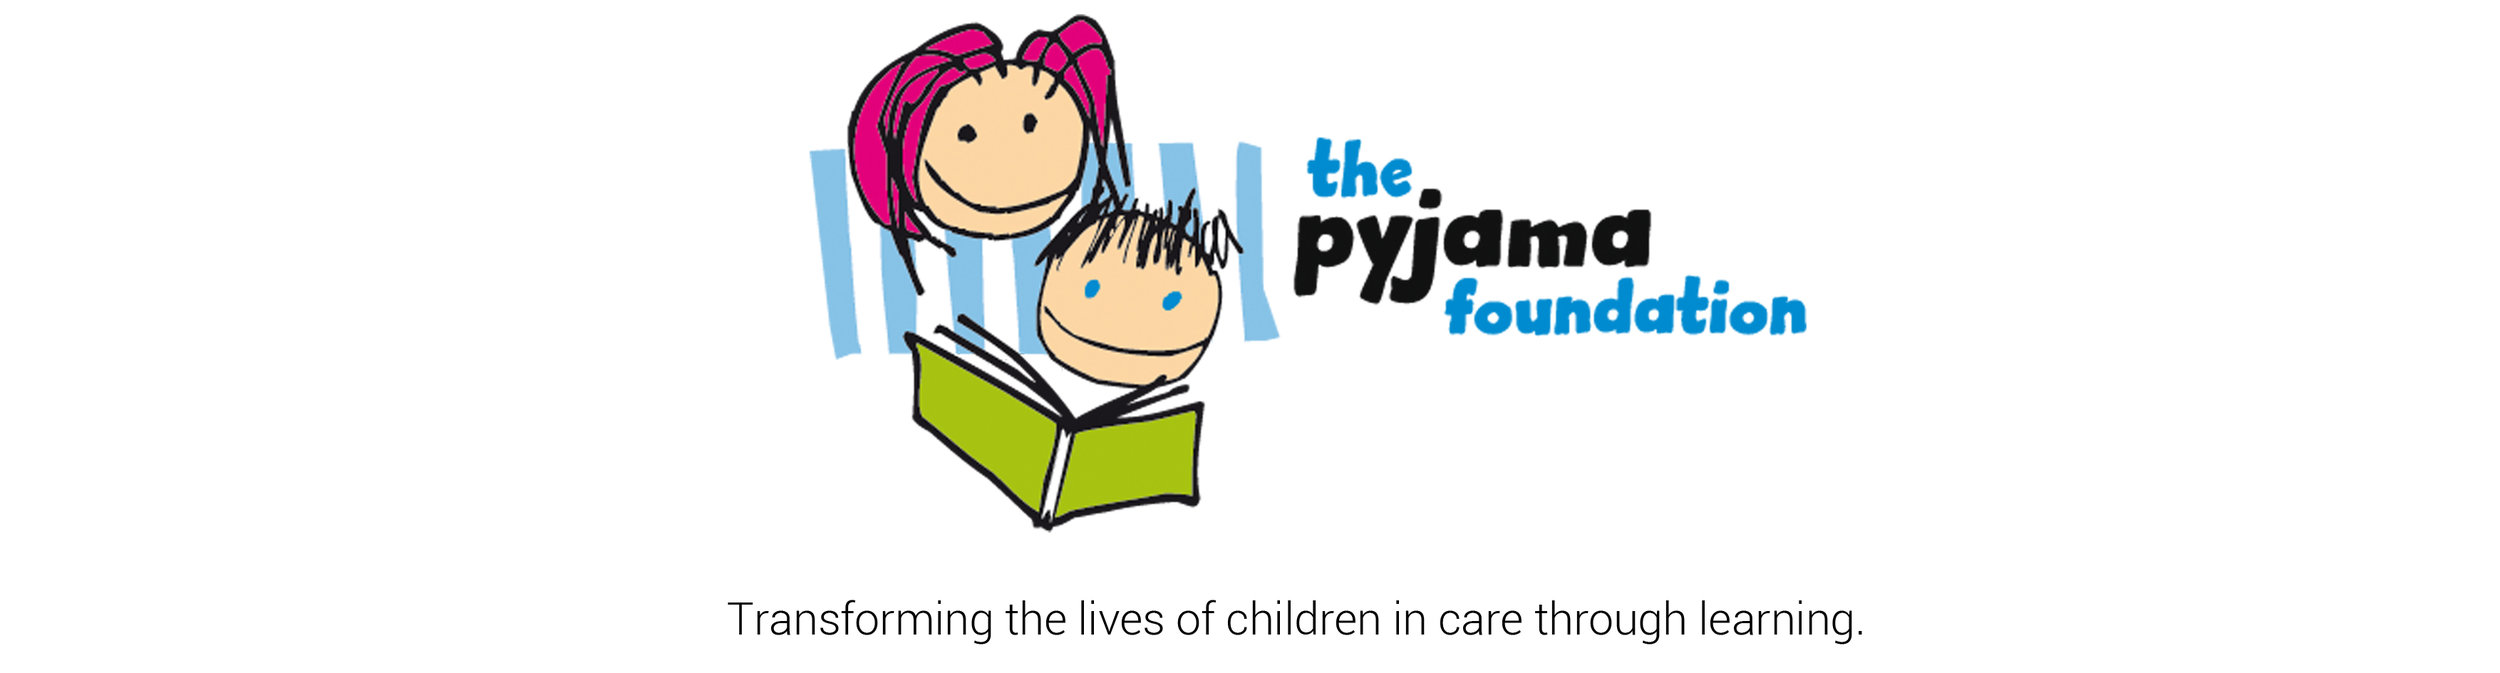 The_Pyjama_Foundation_logo.jpg